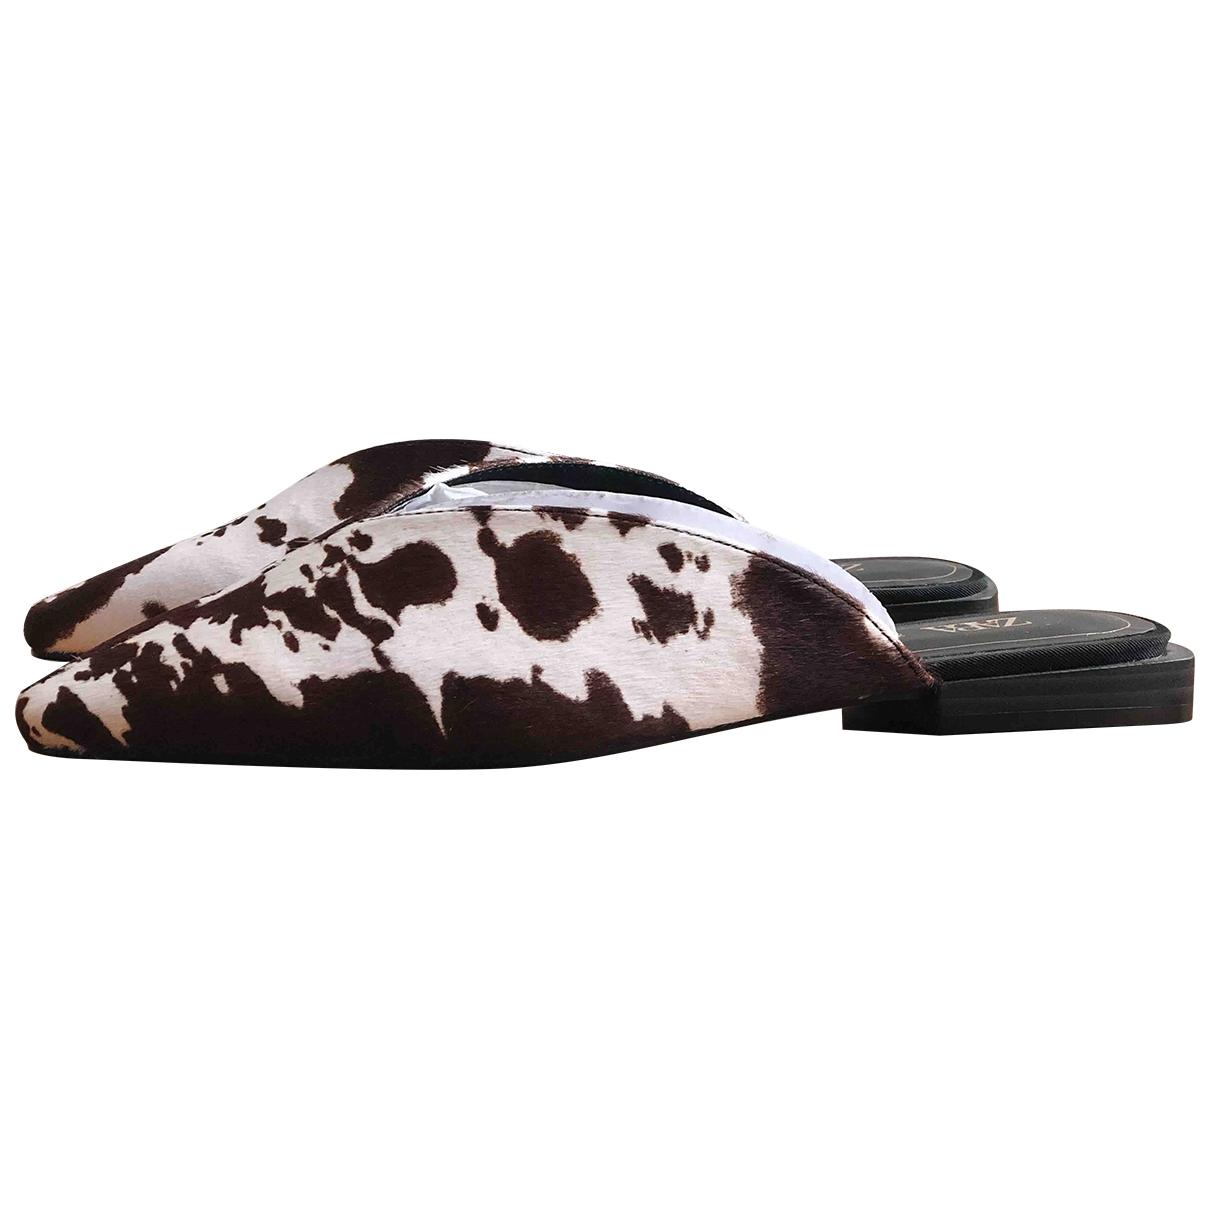 Zara \N Multicolour Leather Mules & Clogs for Women 38 EU